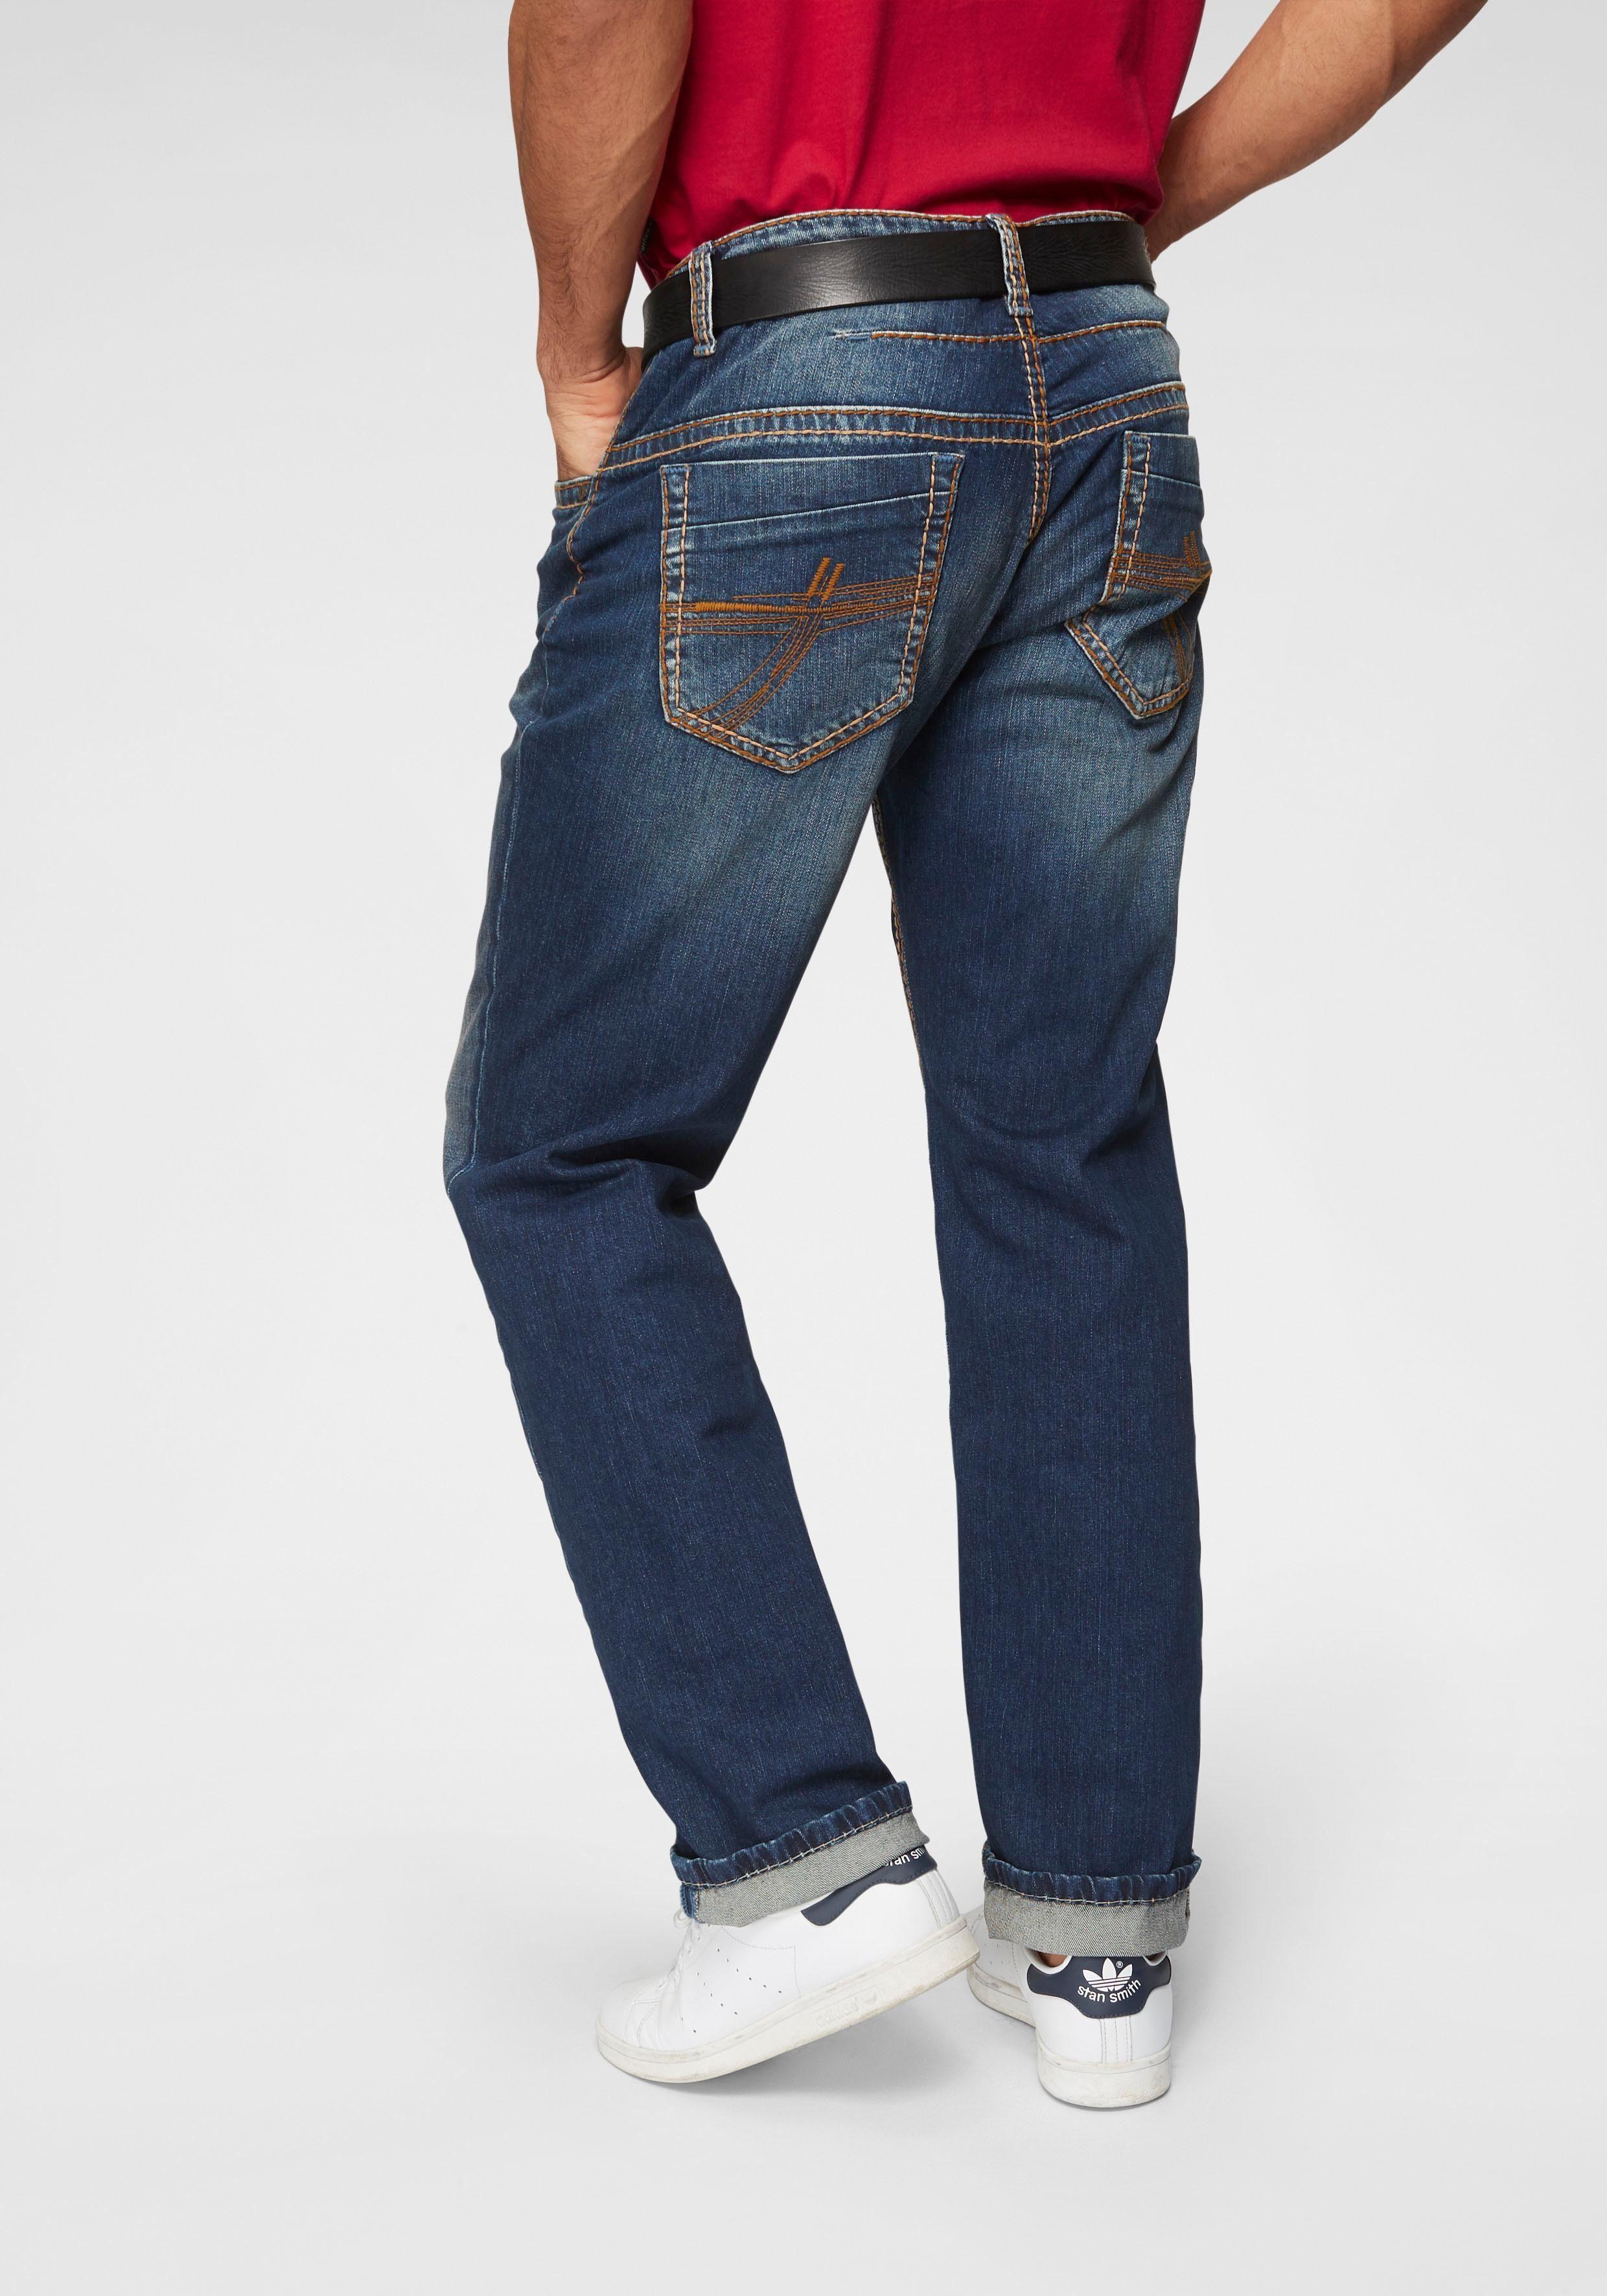 CAMP DAVID Regular-fit-Jeans »CO:NO:R611«